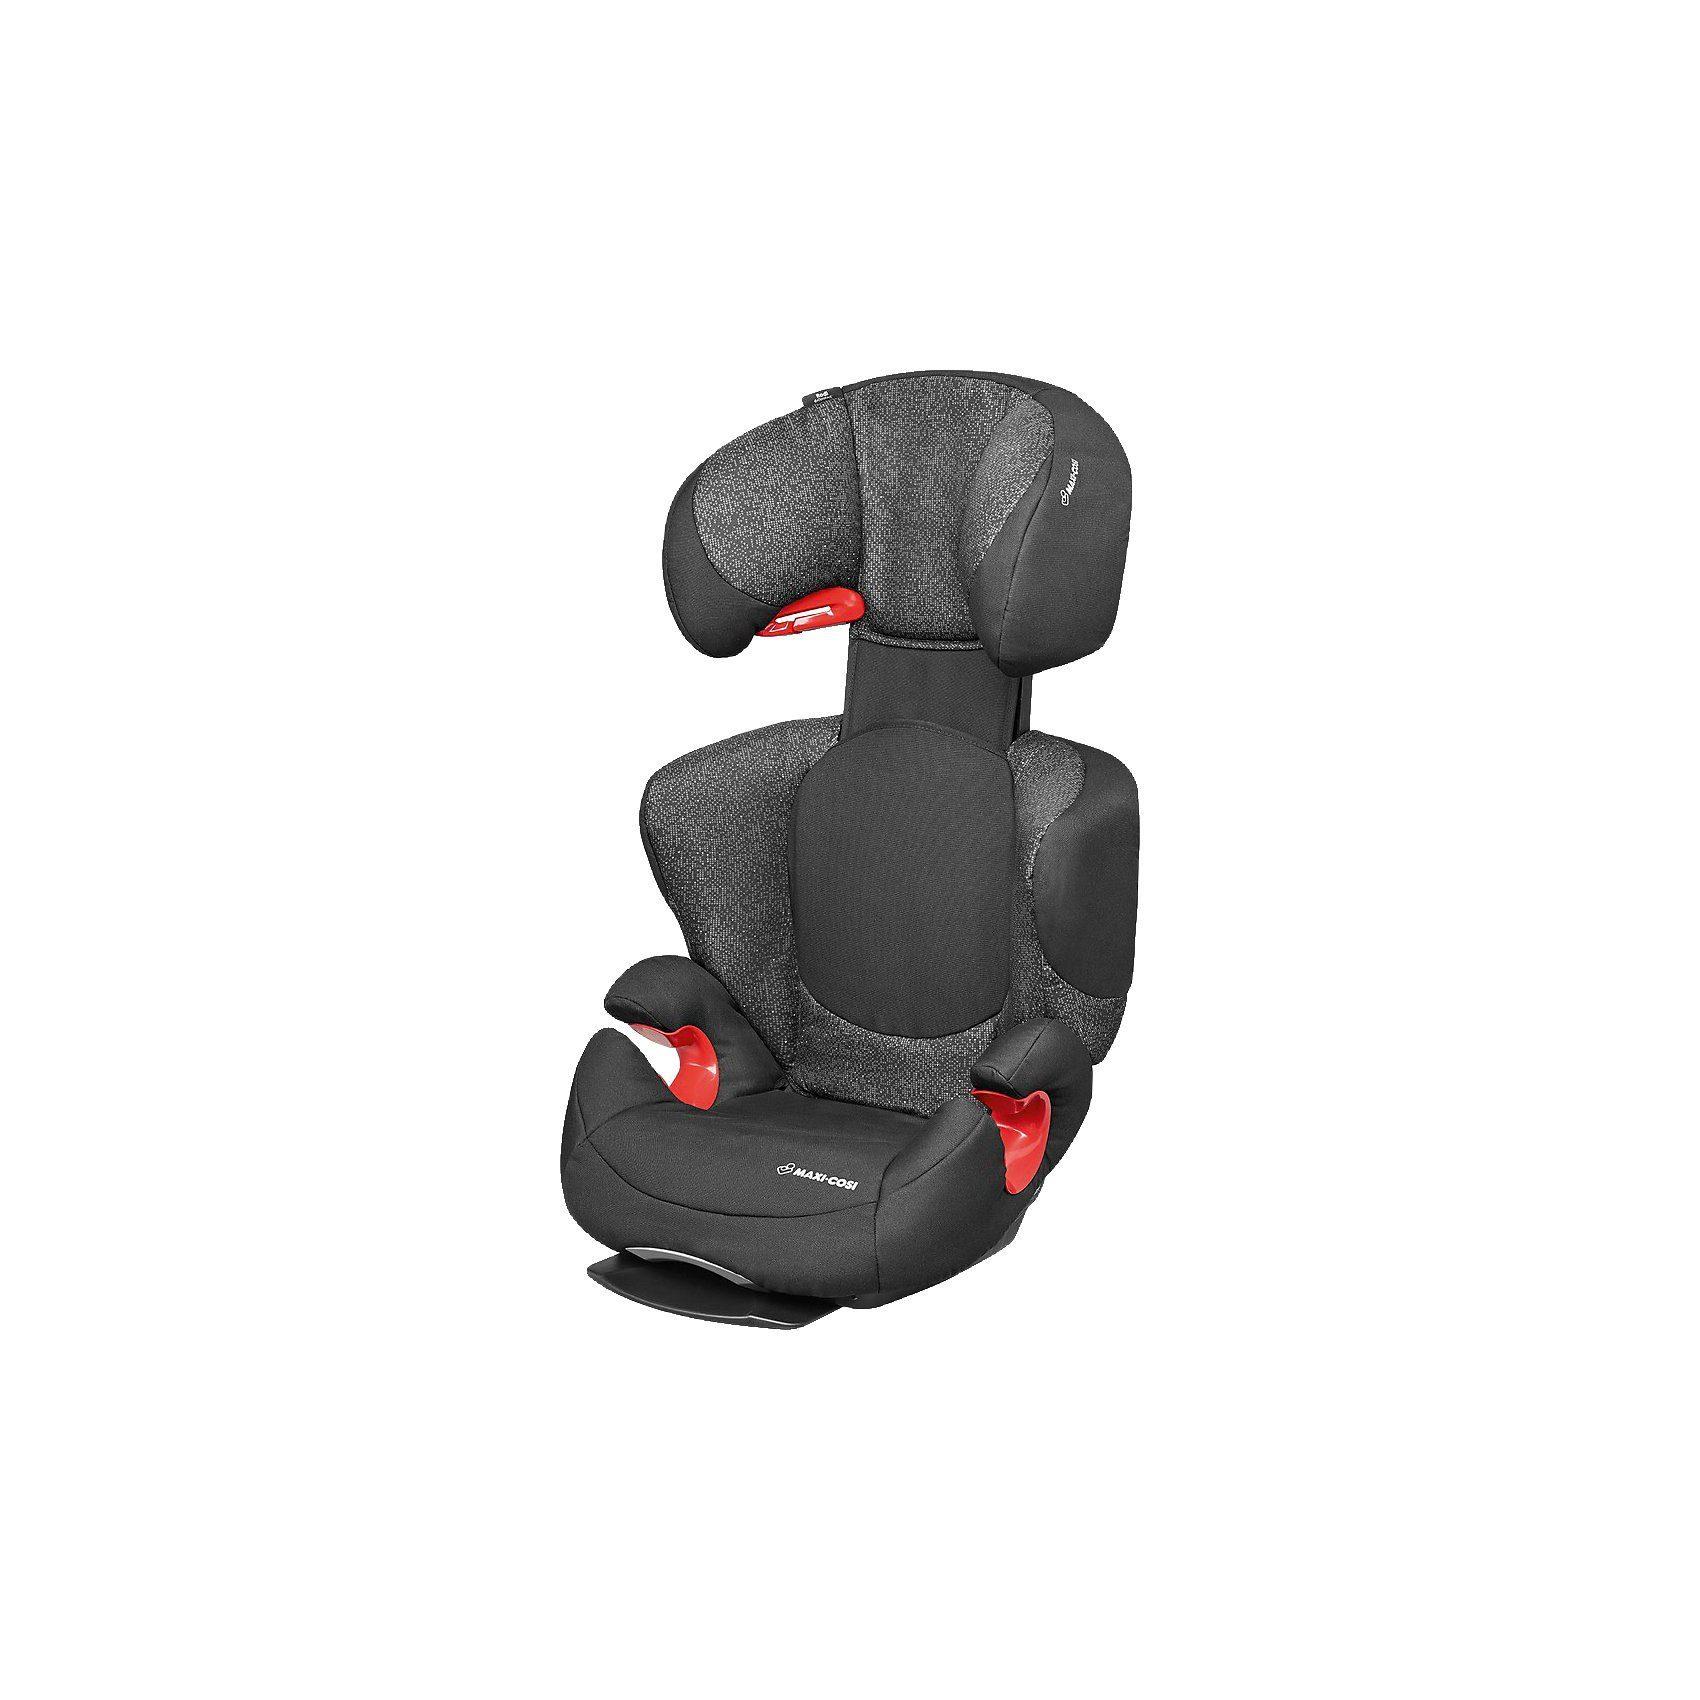 Maxi-Cosi Auto-Kindersitz Rodi AirProtect, Triangle Black, 2018